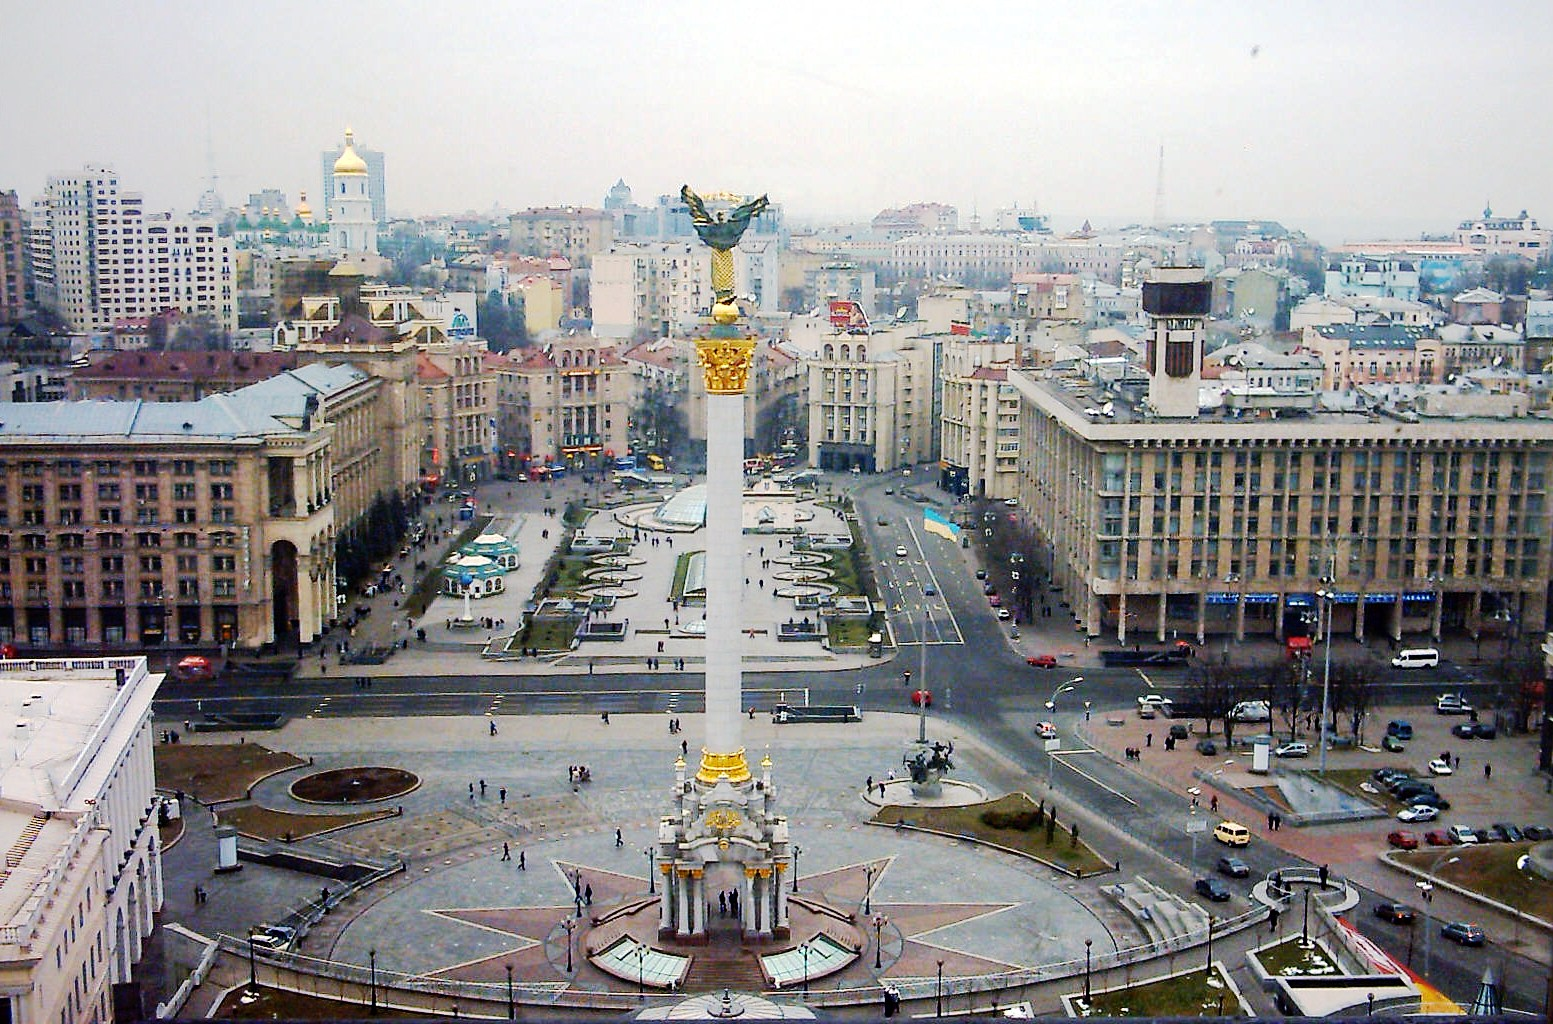 http://img-fotki.yandex.ru/get/6745/225452242.25/0_1370ba_c2fb5c75_orig